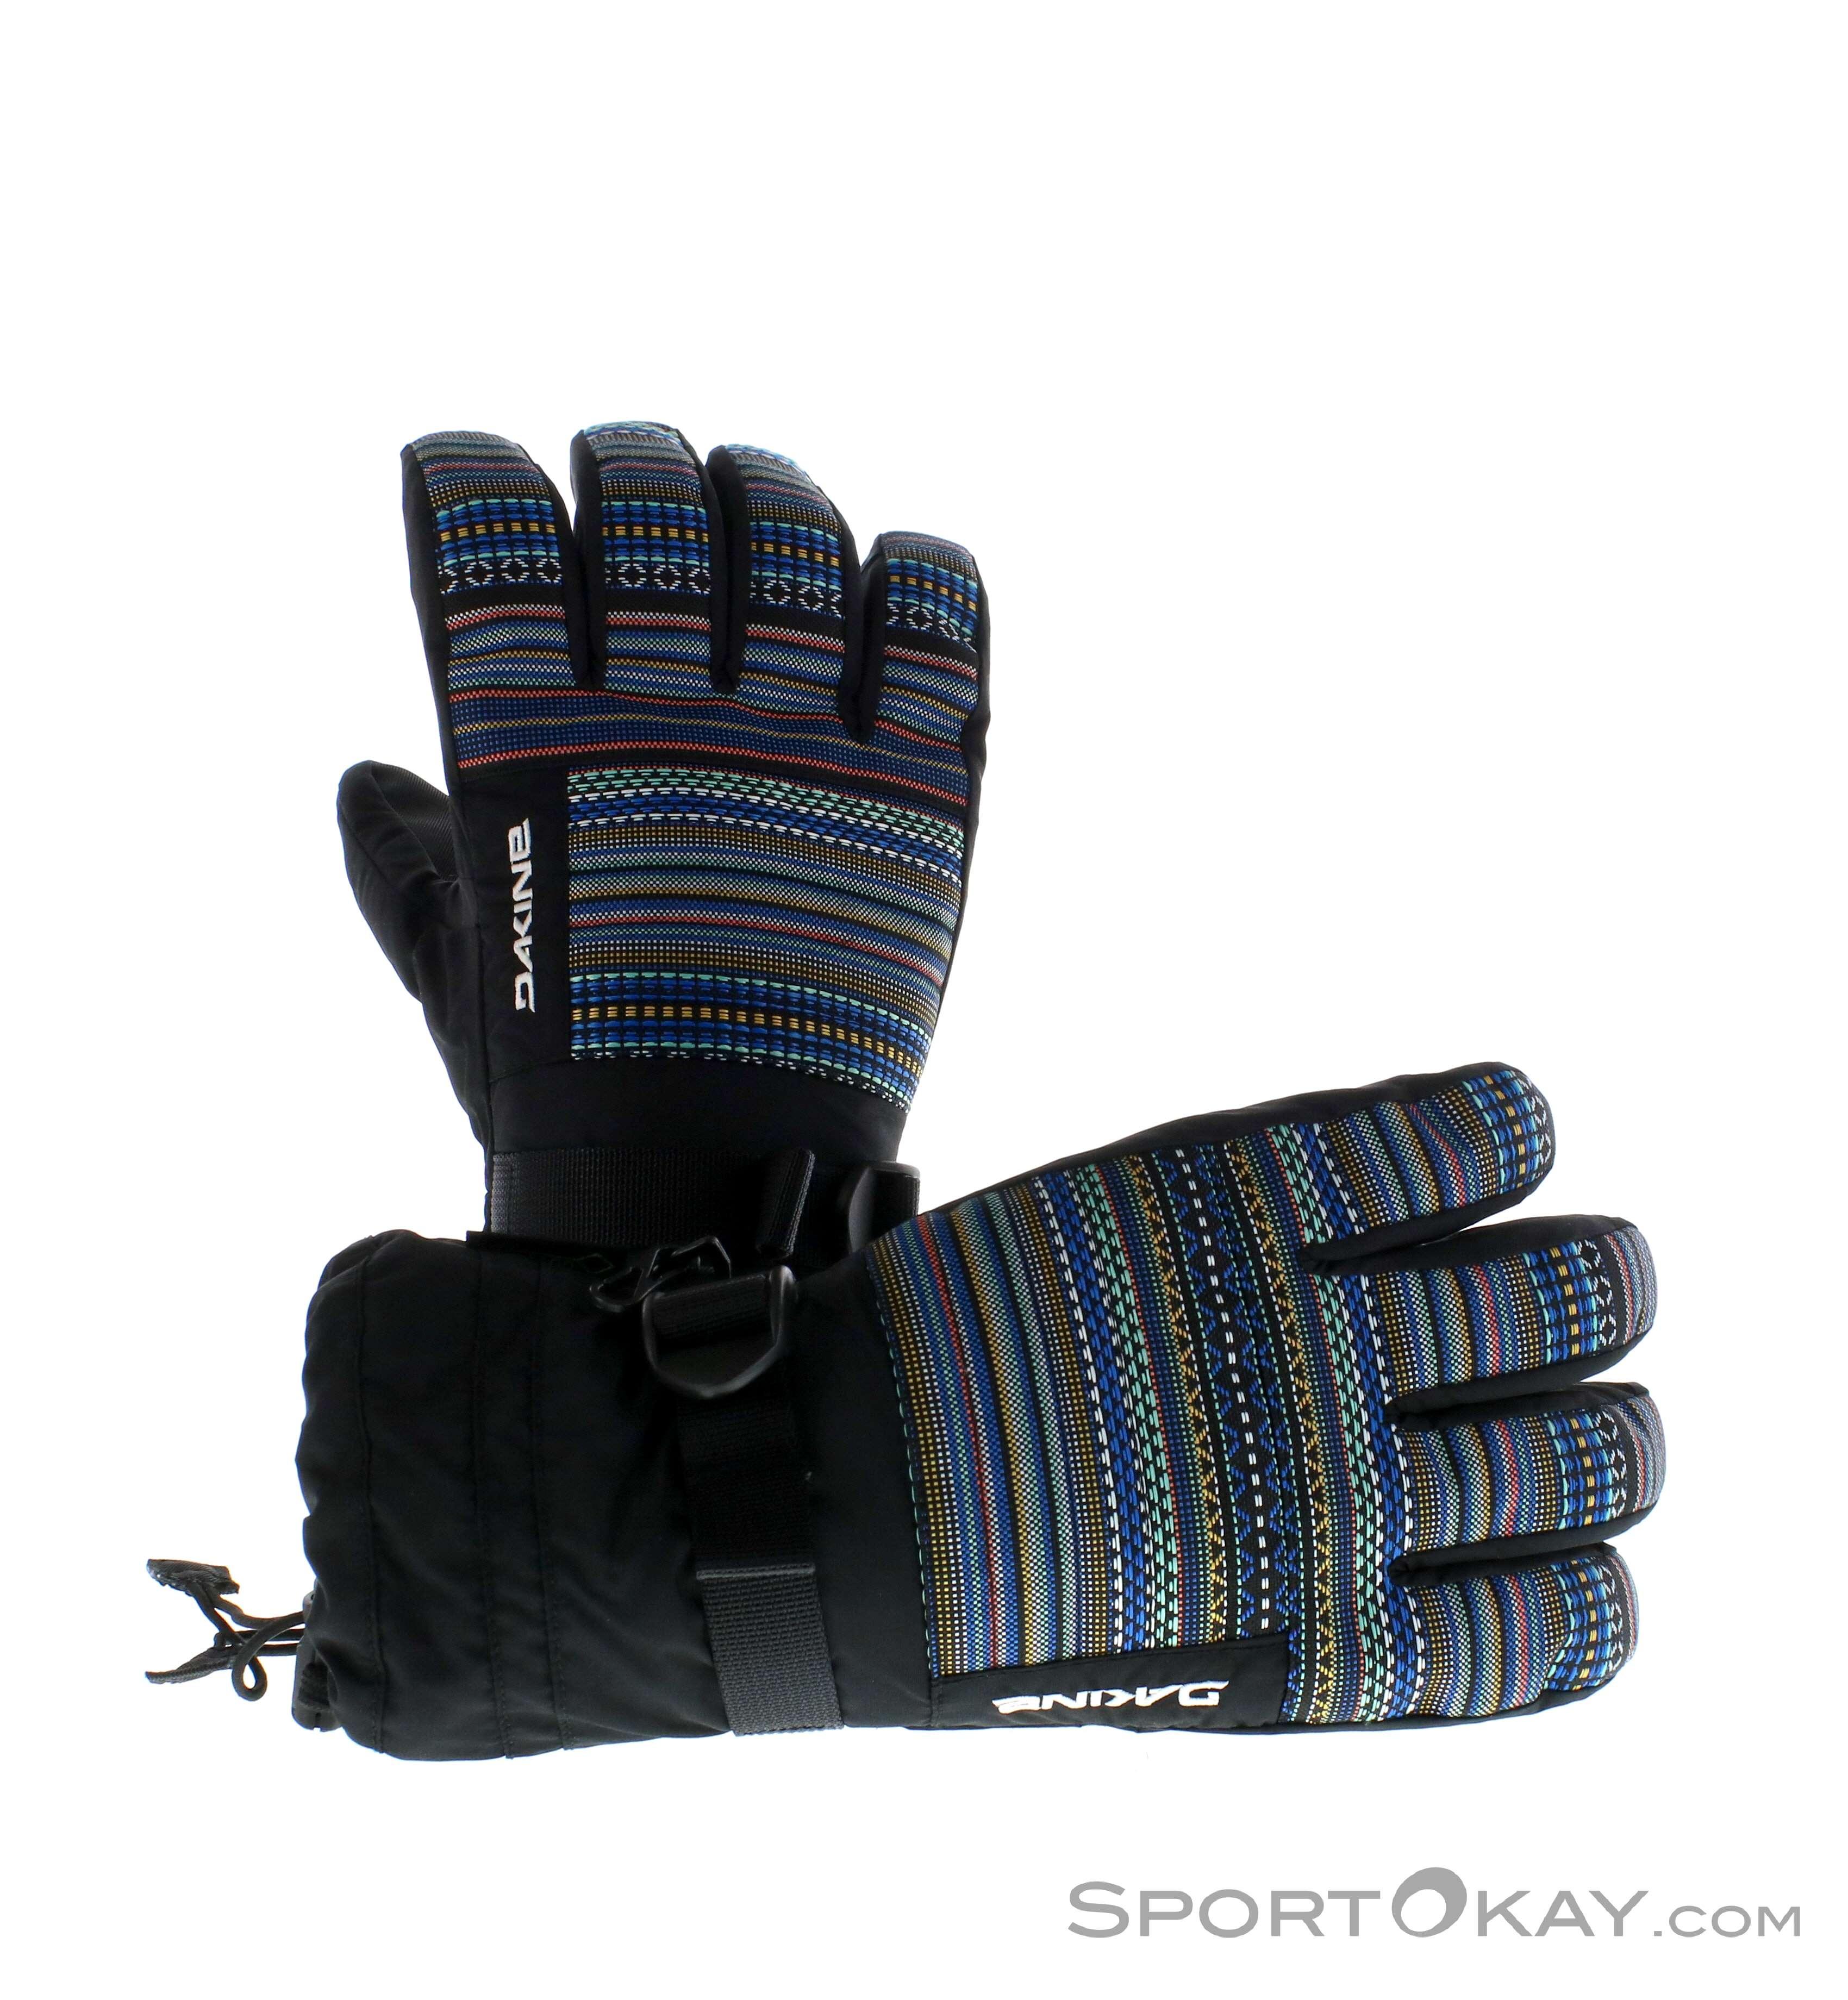 925c262477b1f Dakine Omni Glove Damen Handschuhe Gore-Tex - Skihandschuhe ...